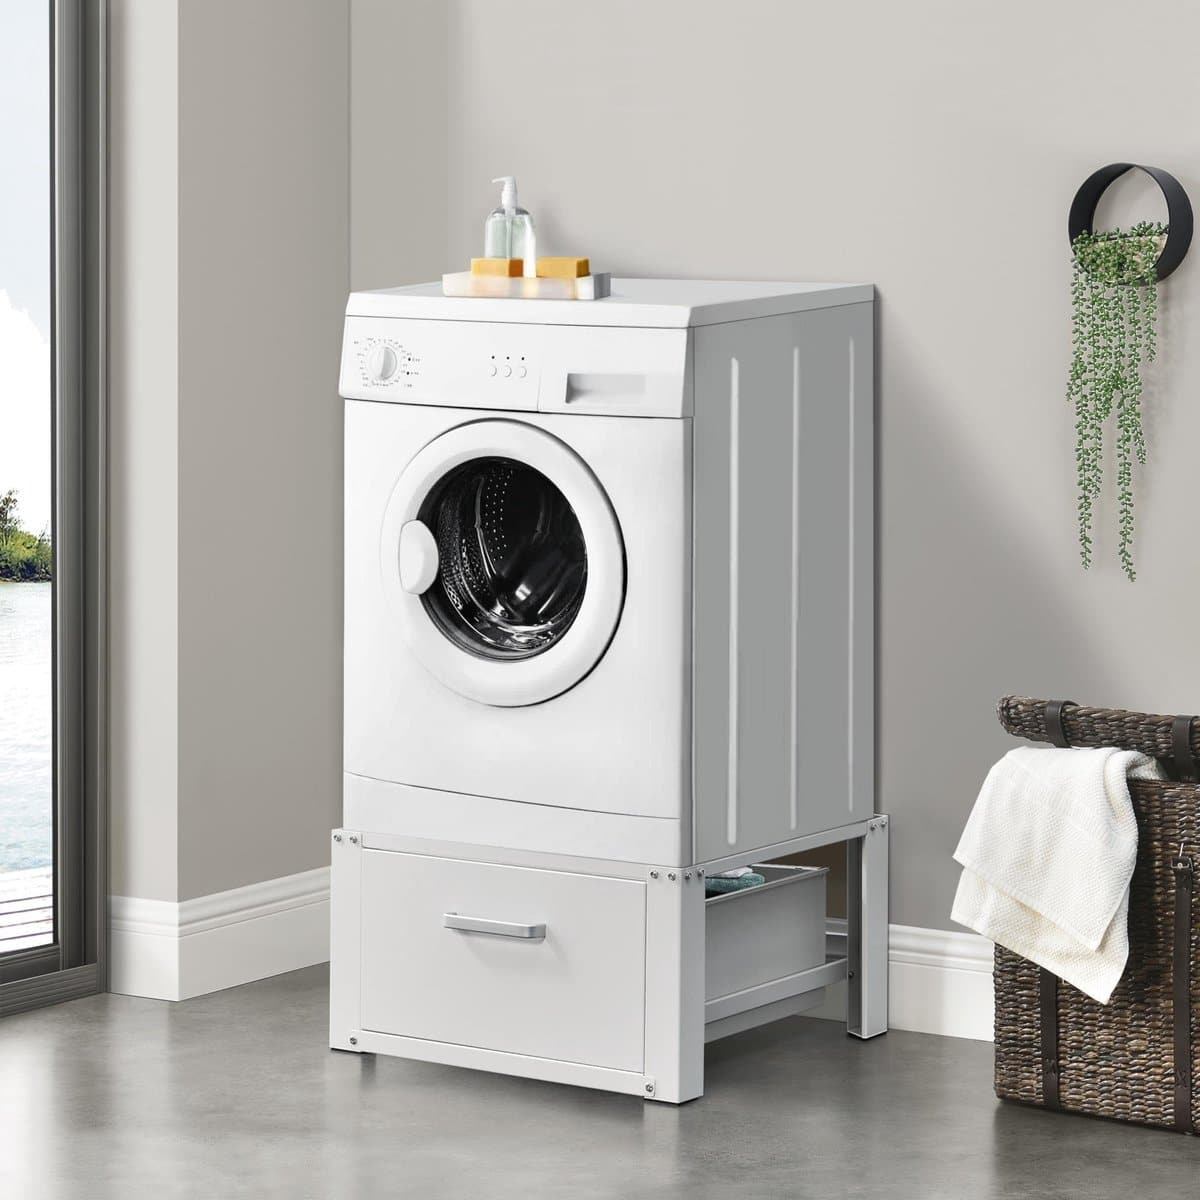 beste-wasmachine-verhogers